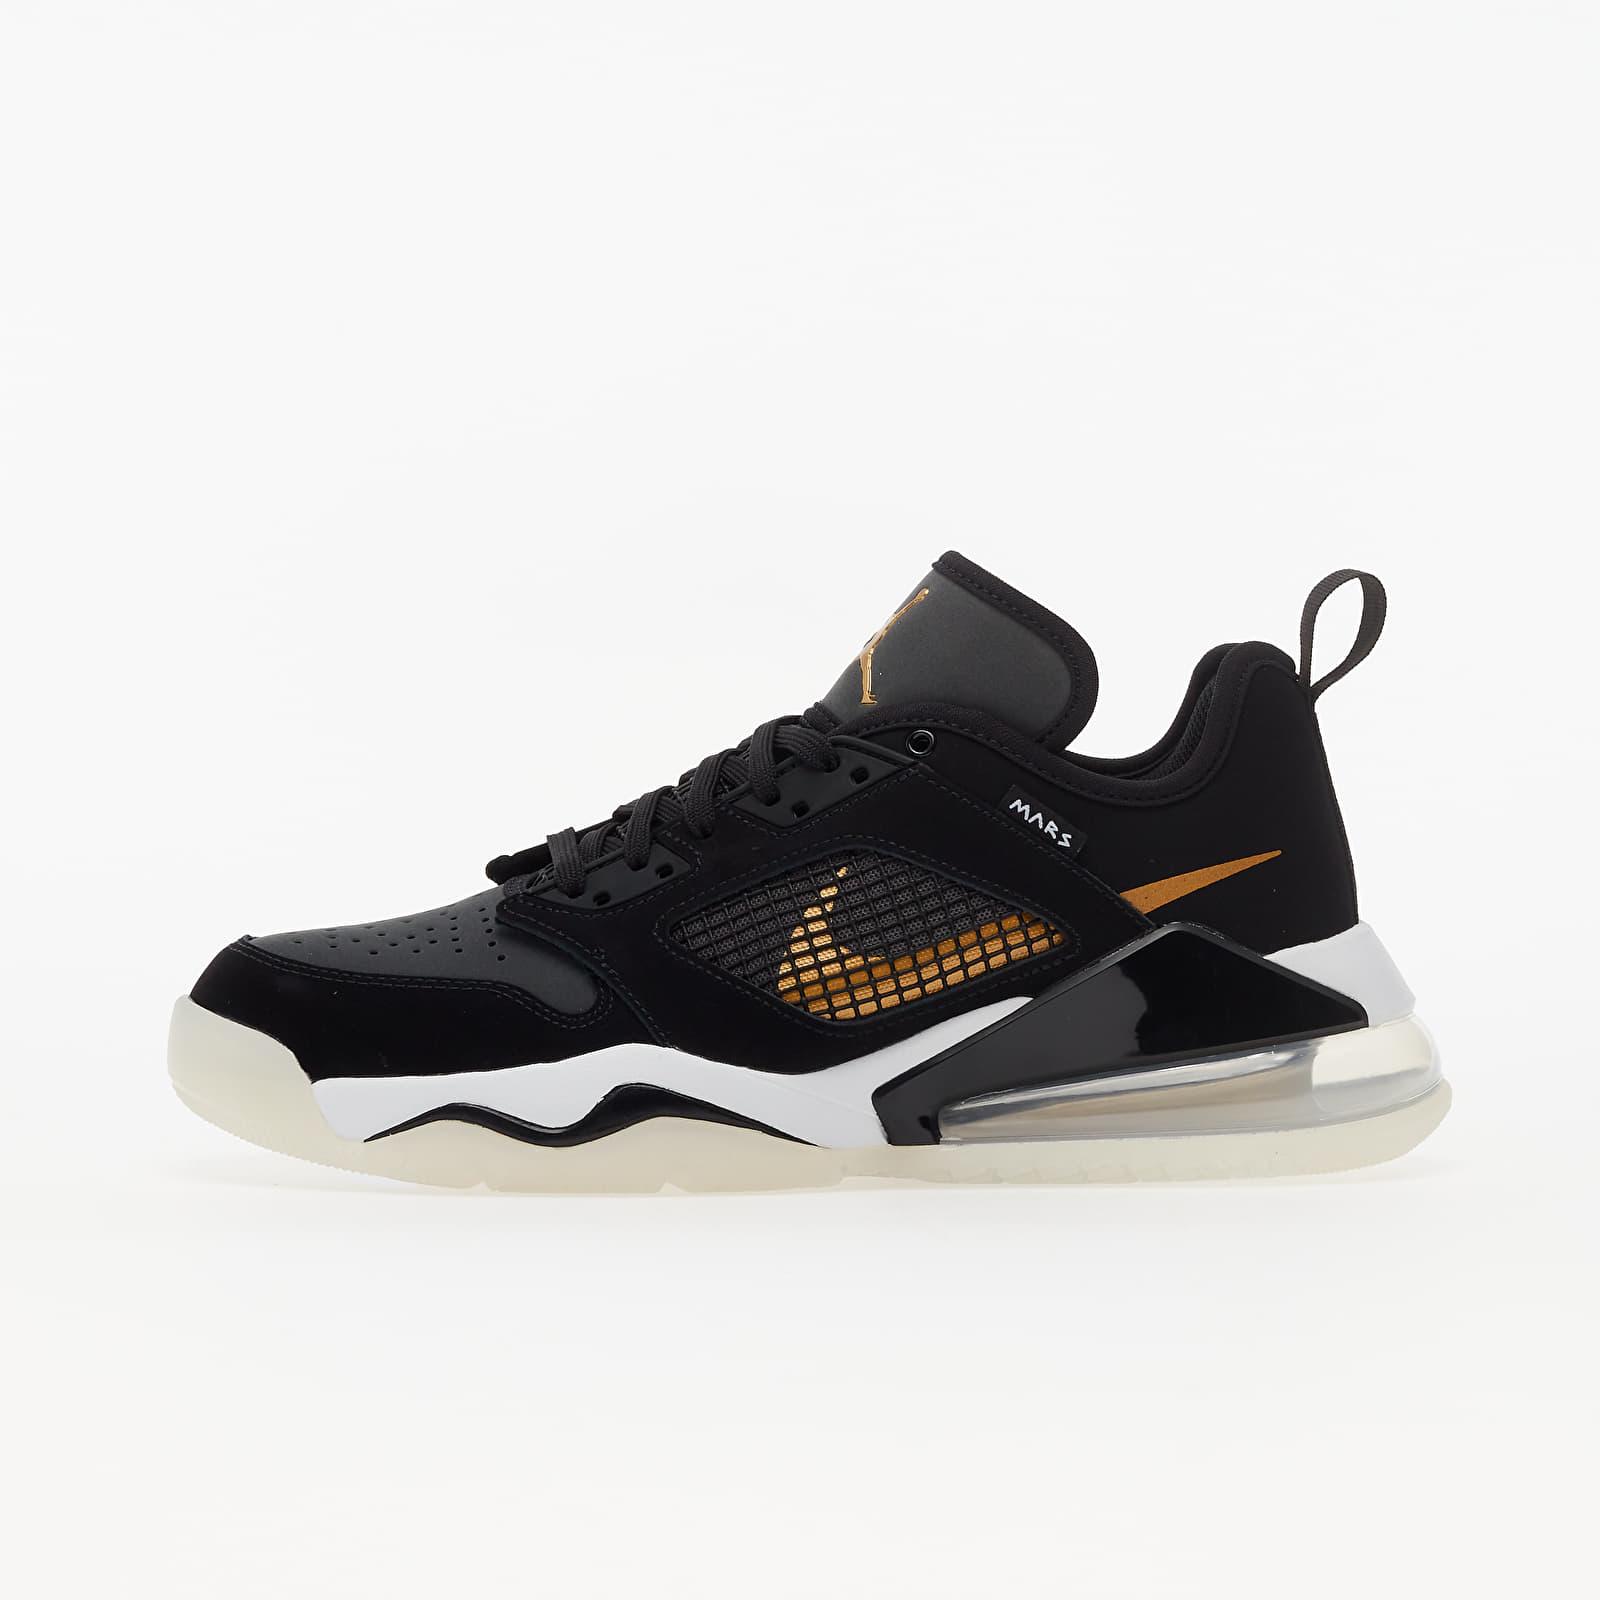 Pánské tenisky a boty Jordan Mars 270 Low Black/ Metallic Gold-Dk Smoke Grey-White